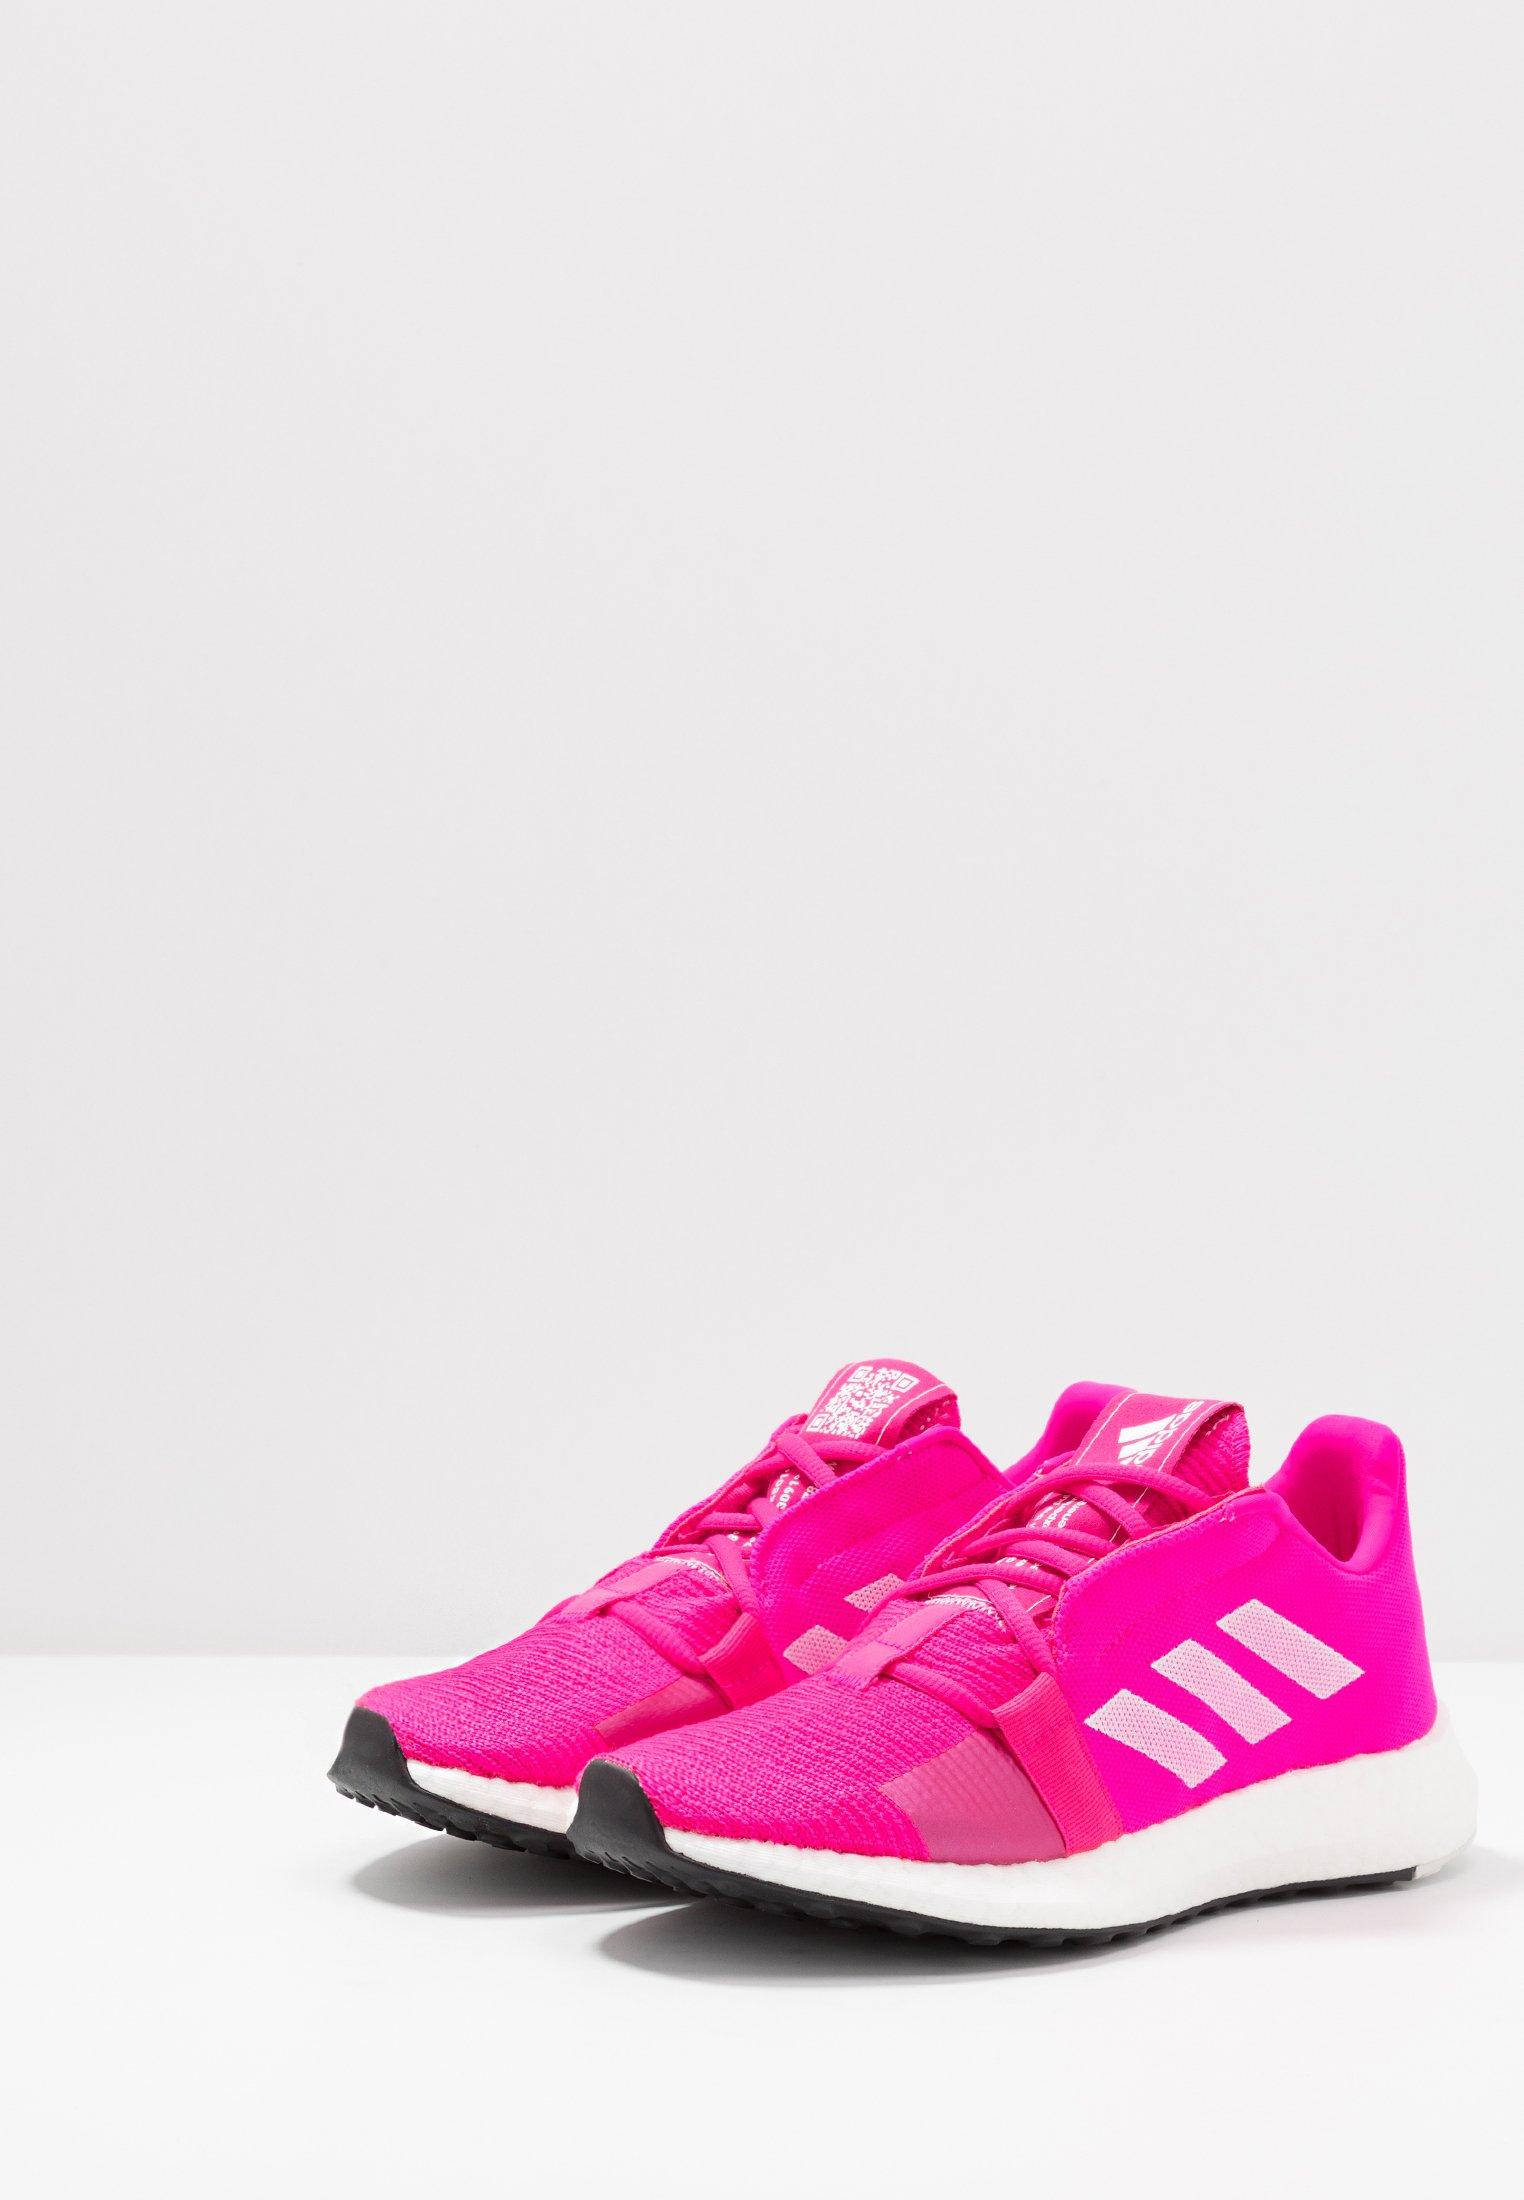 Adidas Performance Senseboost Go - Laufschuh Neutral Shock Pink/footwear White/real Magenta Black Friday